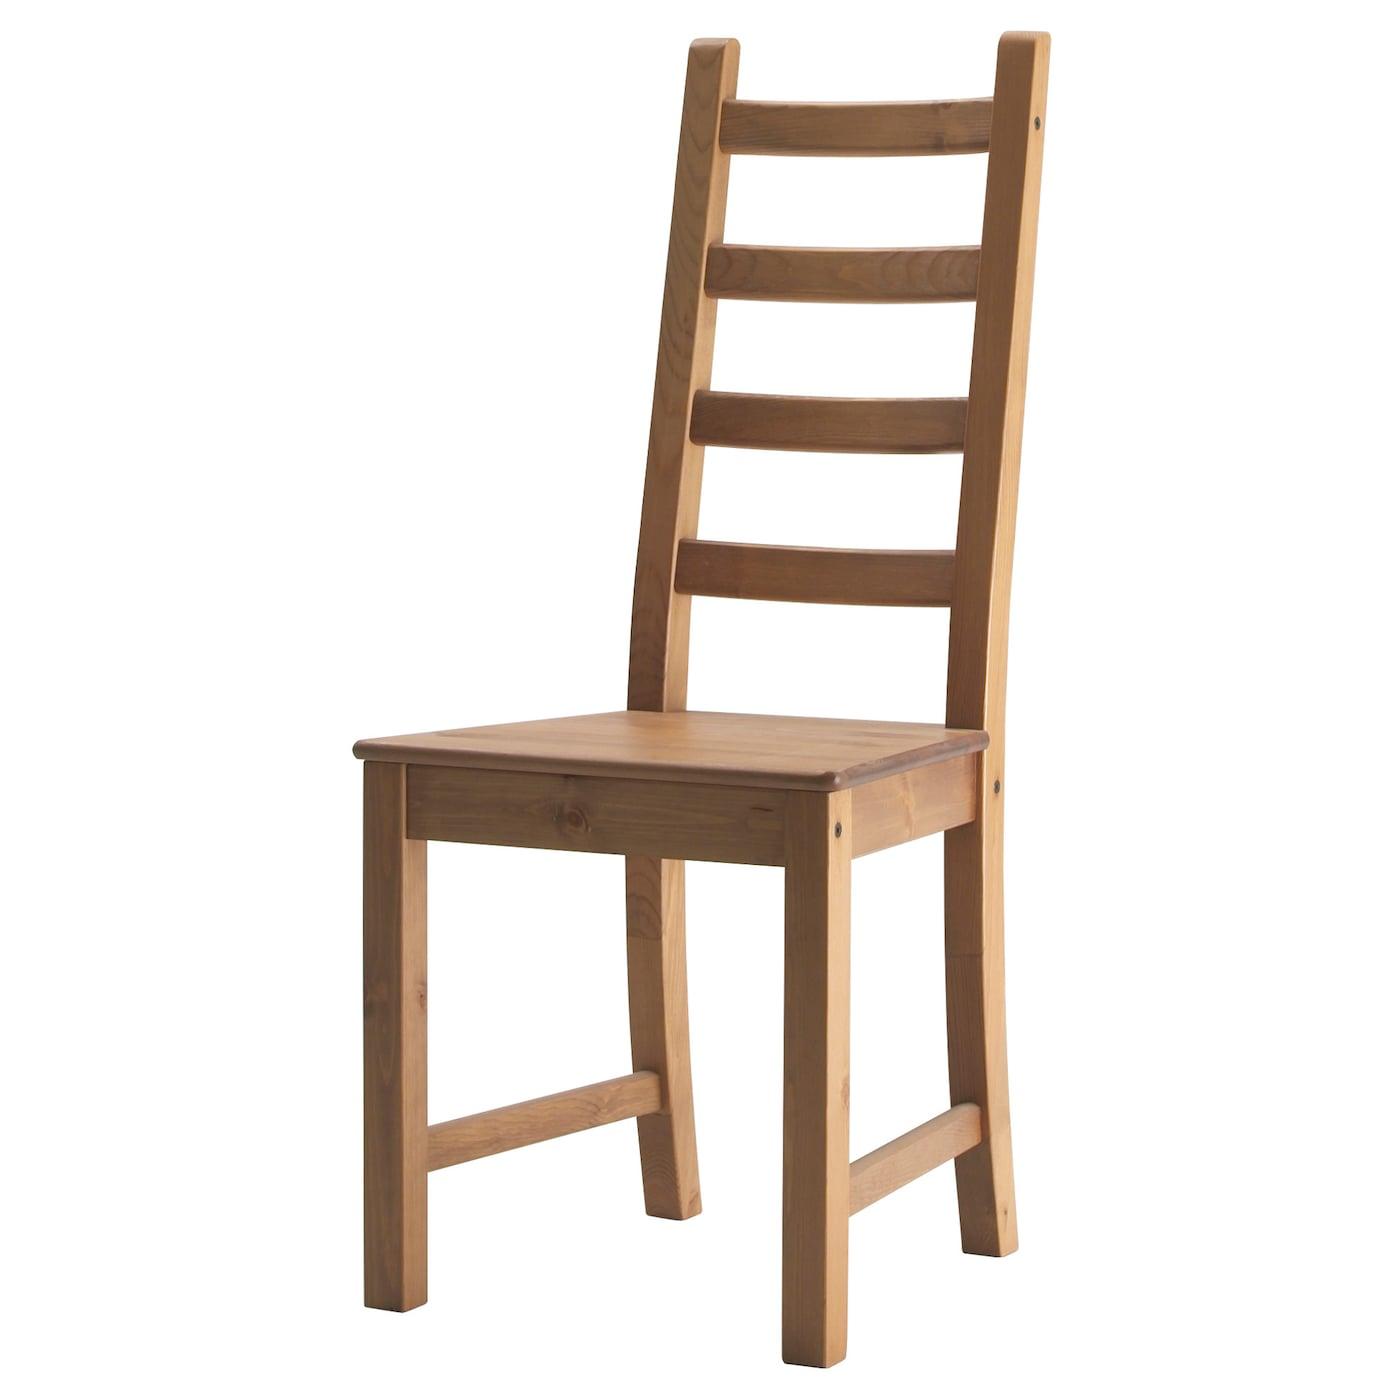 malinda stoelkussen zwart 40 35x38x7 cm ikea. Black Bedroom Furniture Sets. Home Design Ideas